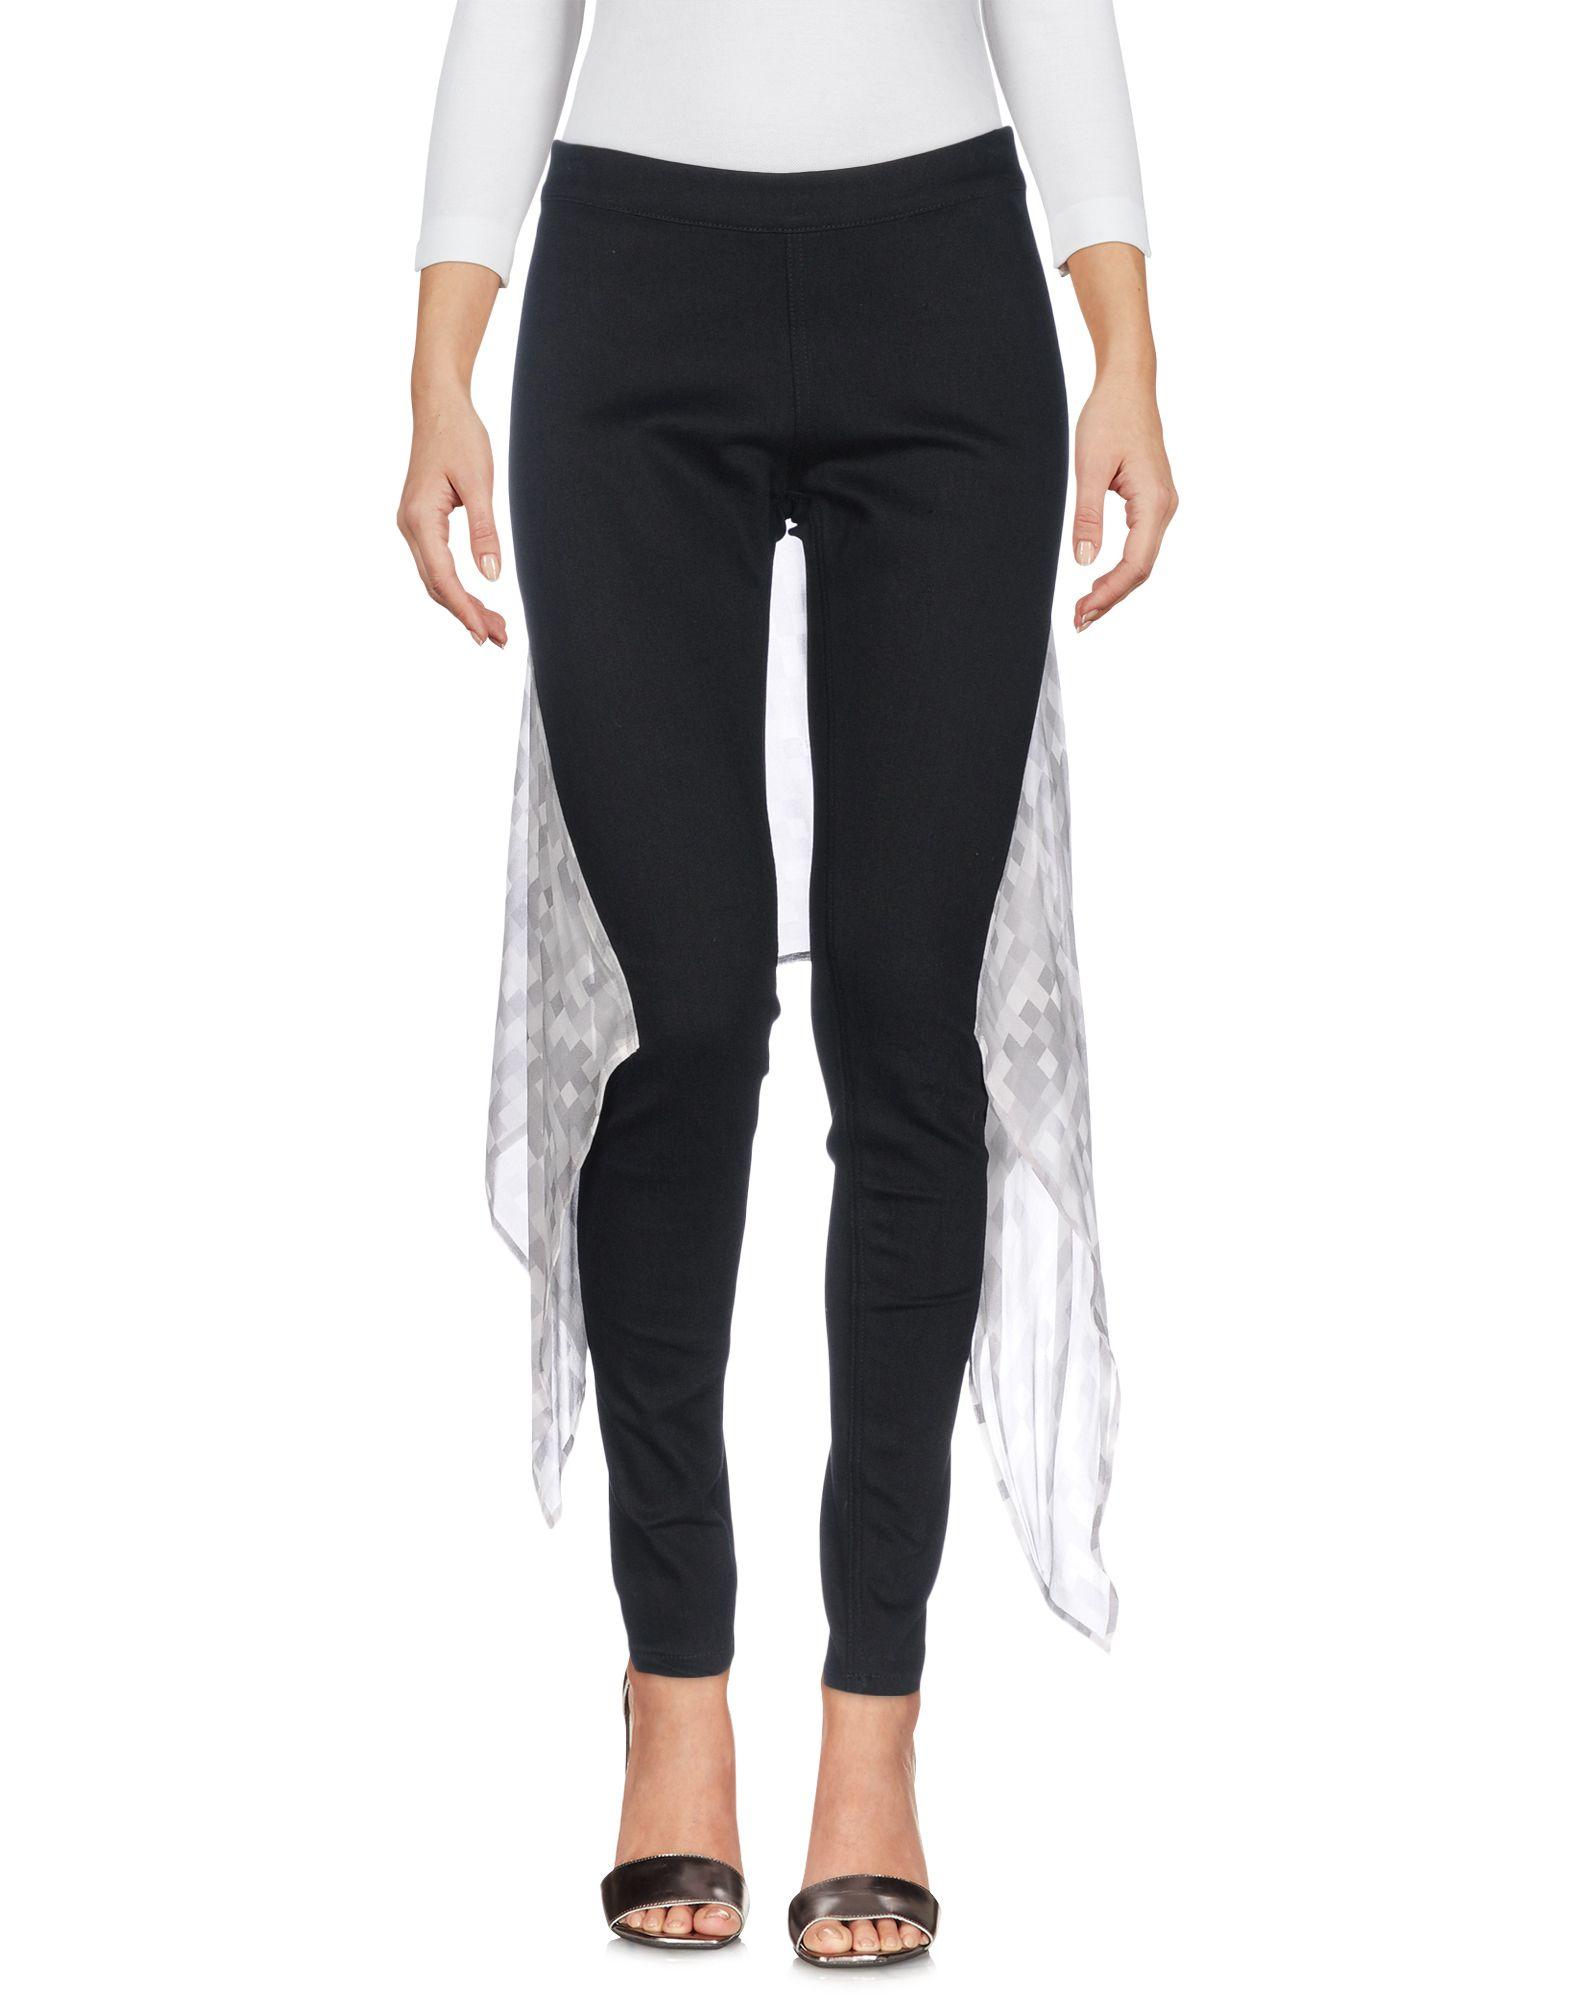 Pantaloni Jeans Gareth Pugh Donna - Acquista online su nmfXHhB4ev